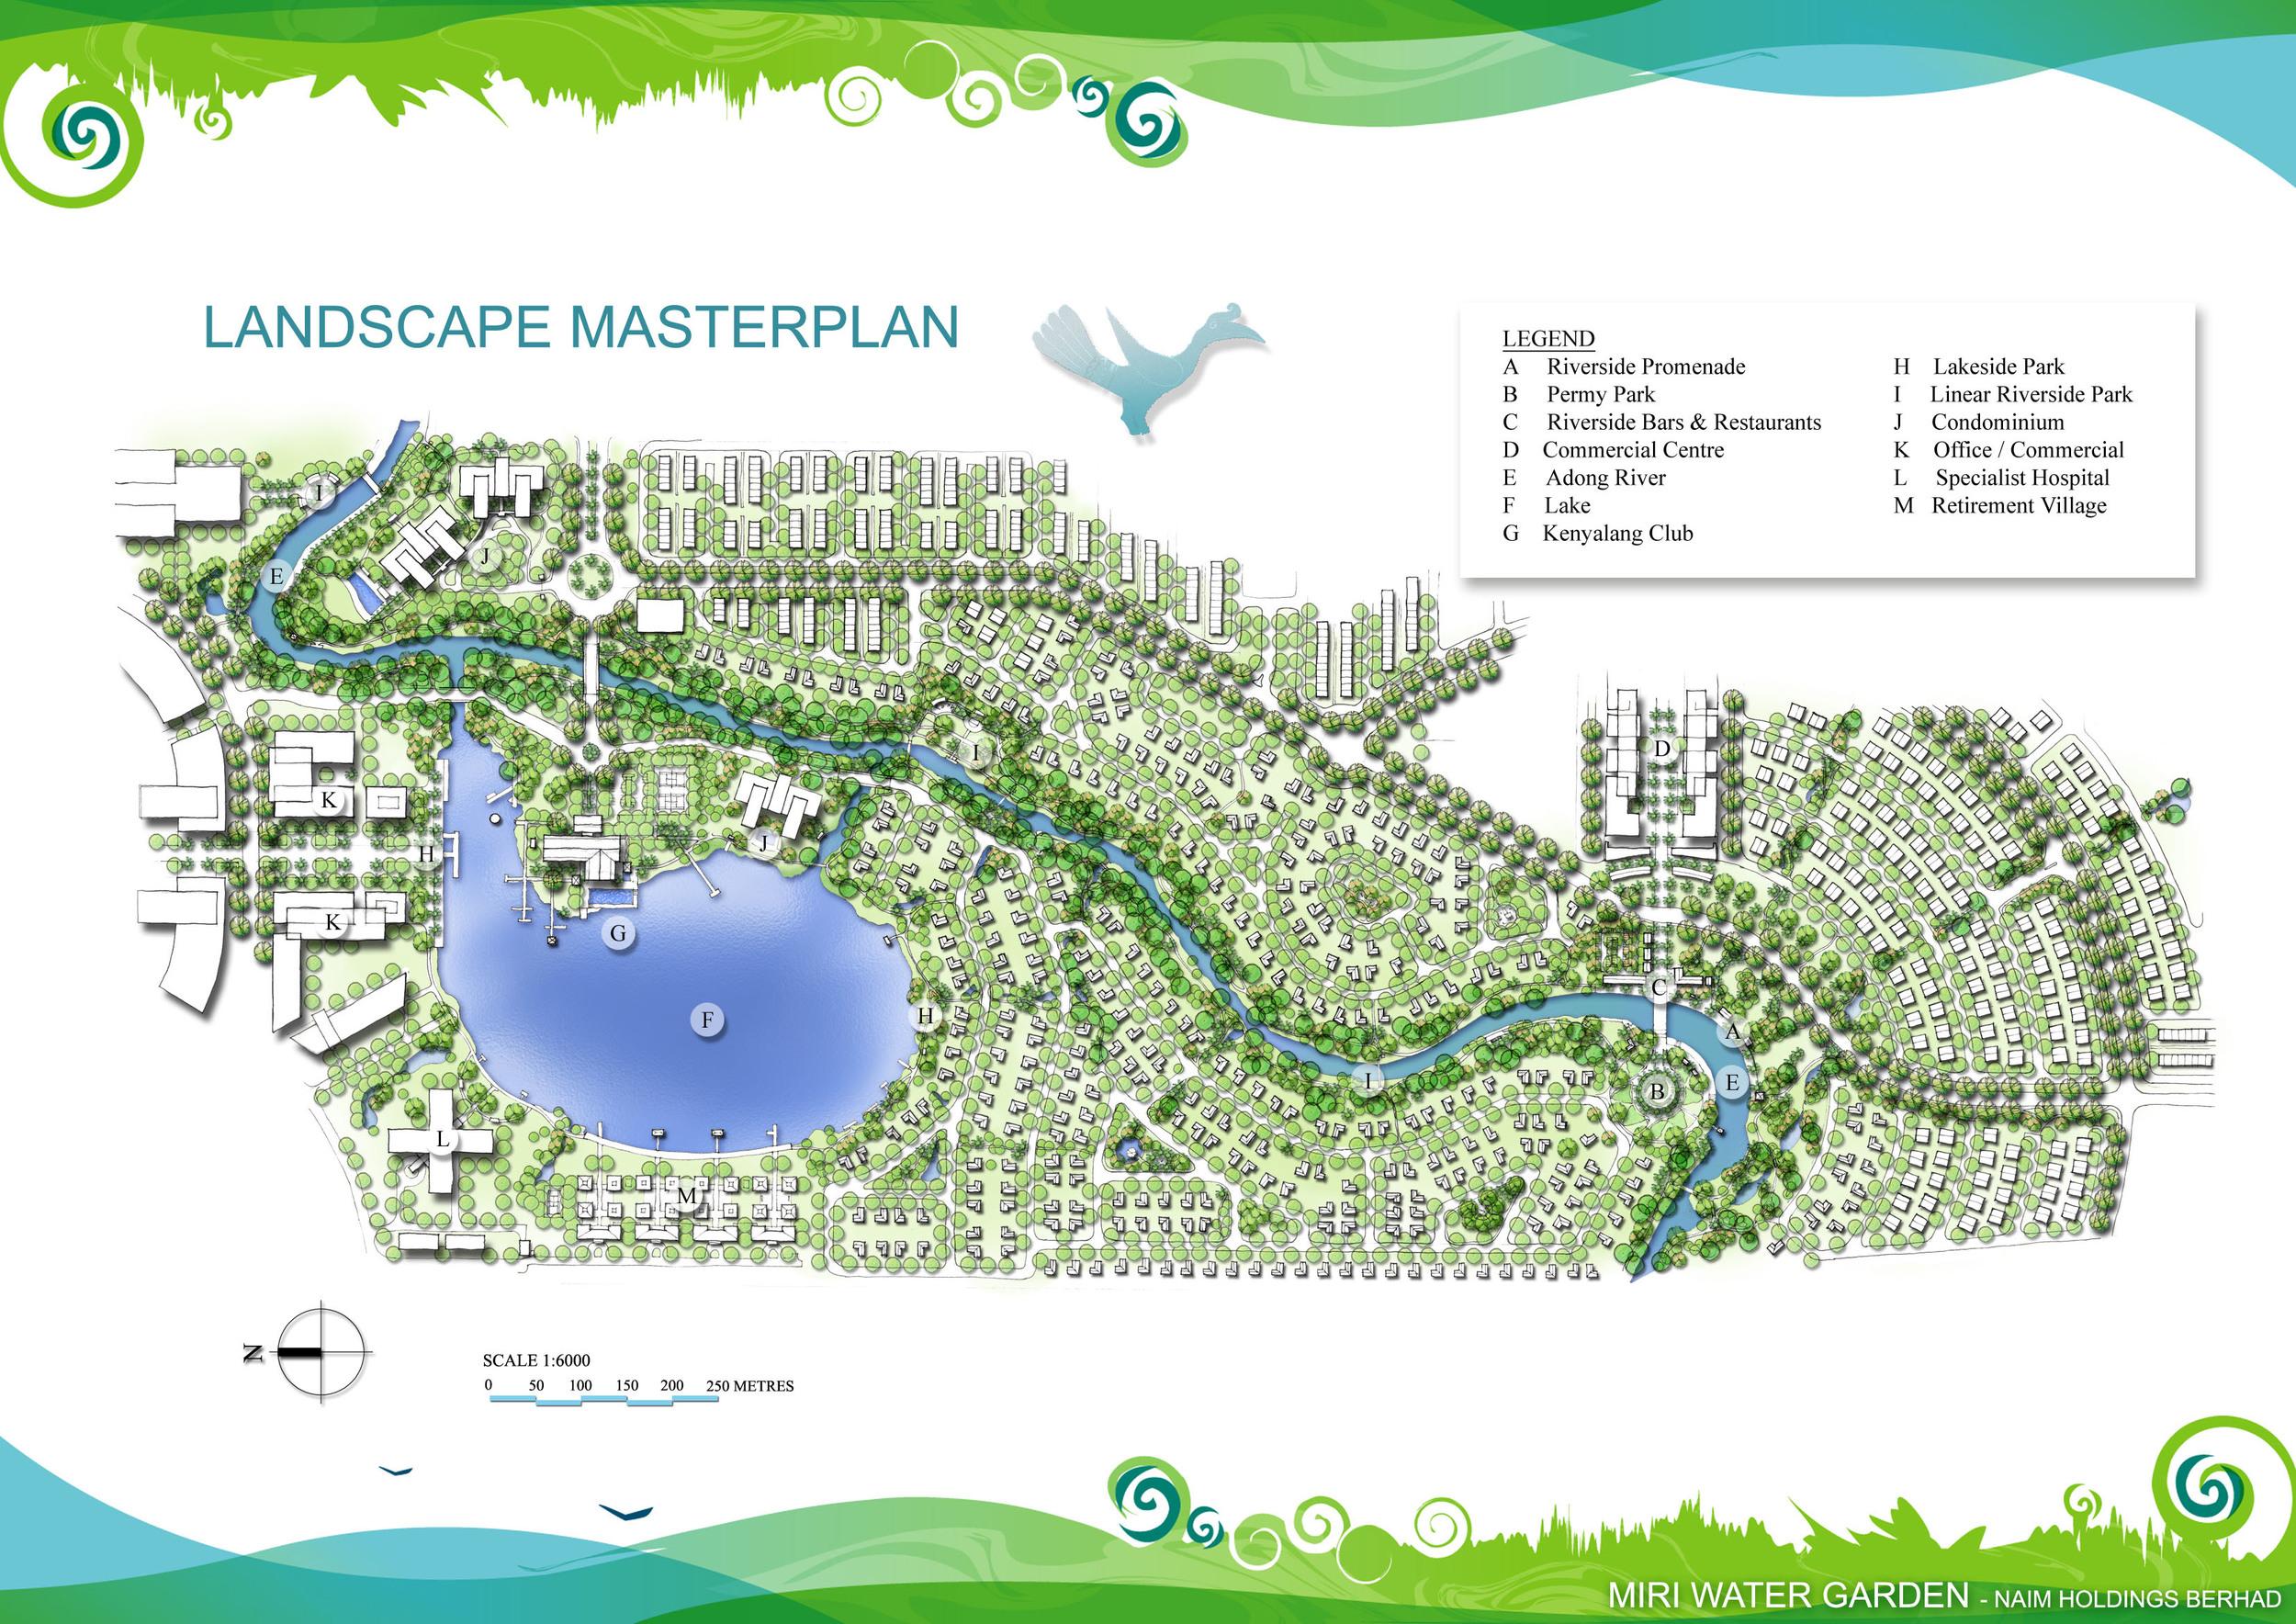 2 Landscape Masterplan on A3 scld.jpg